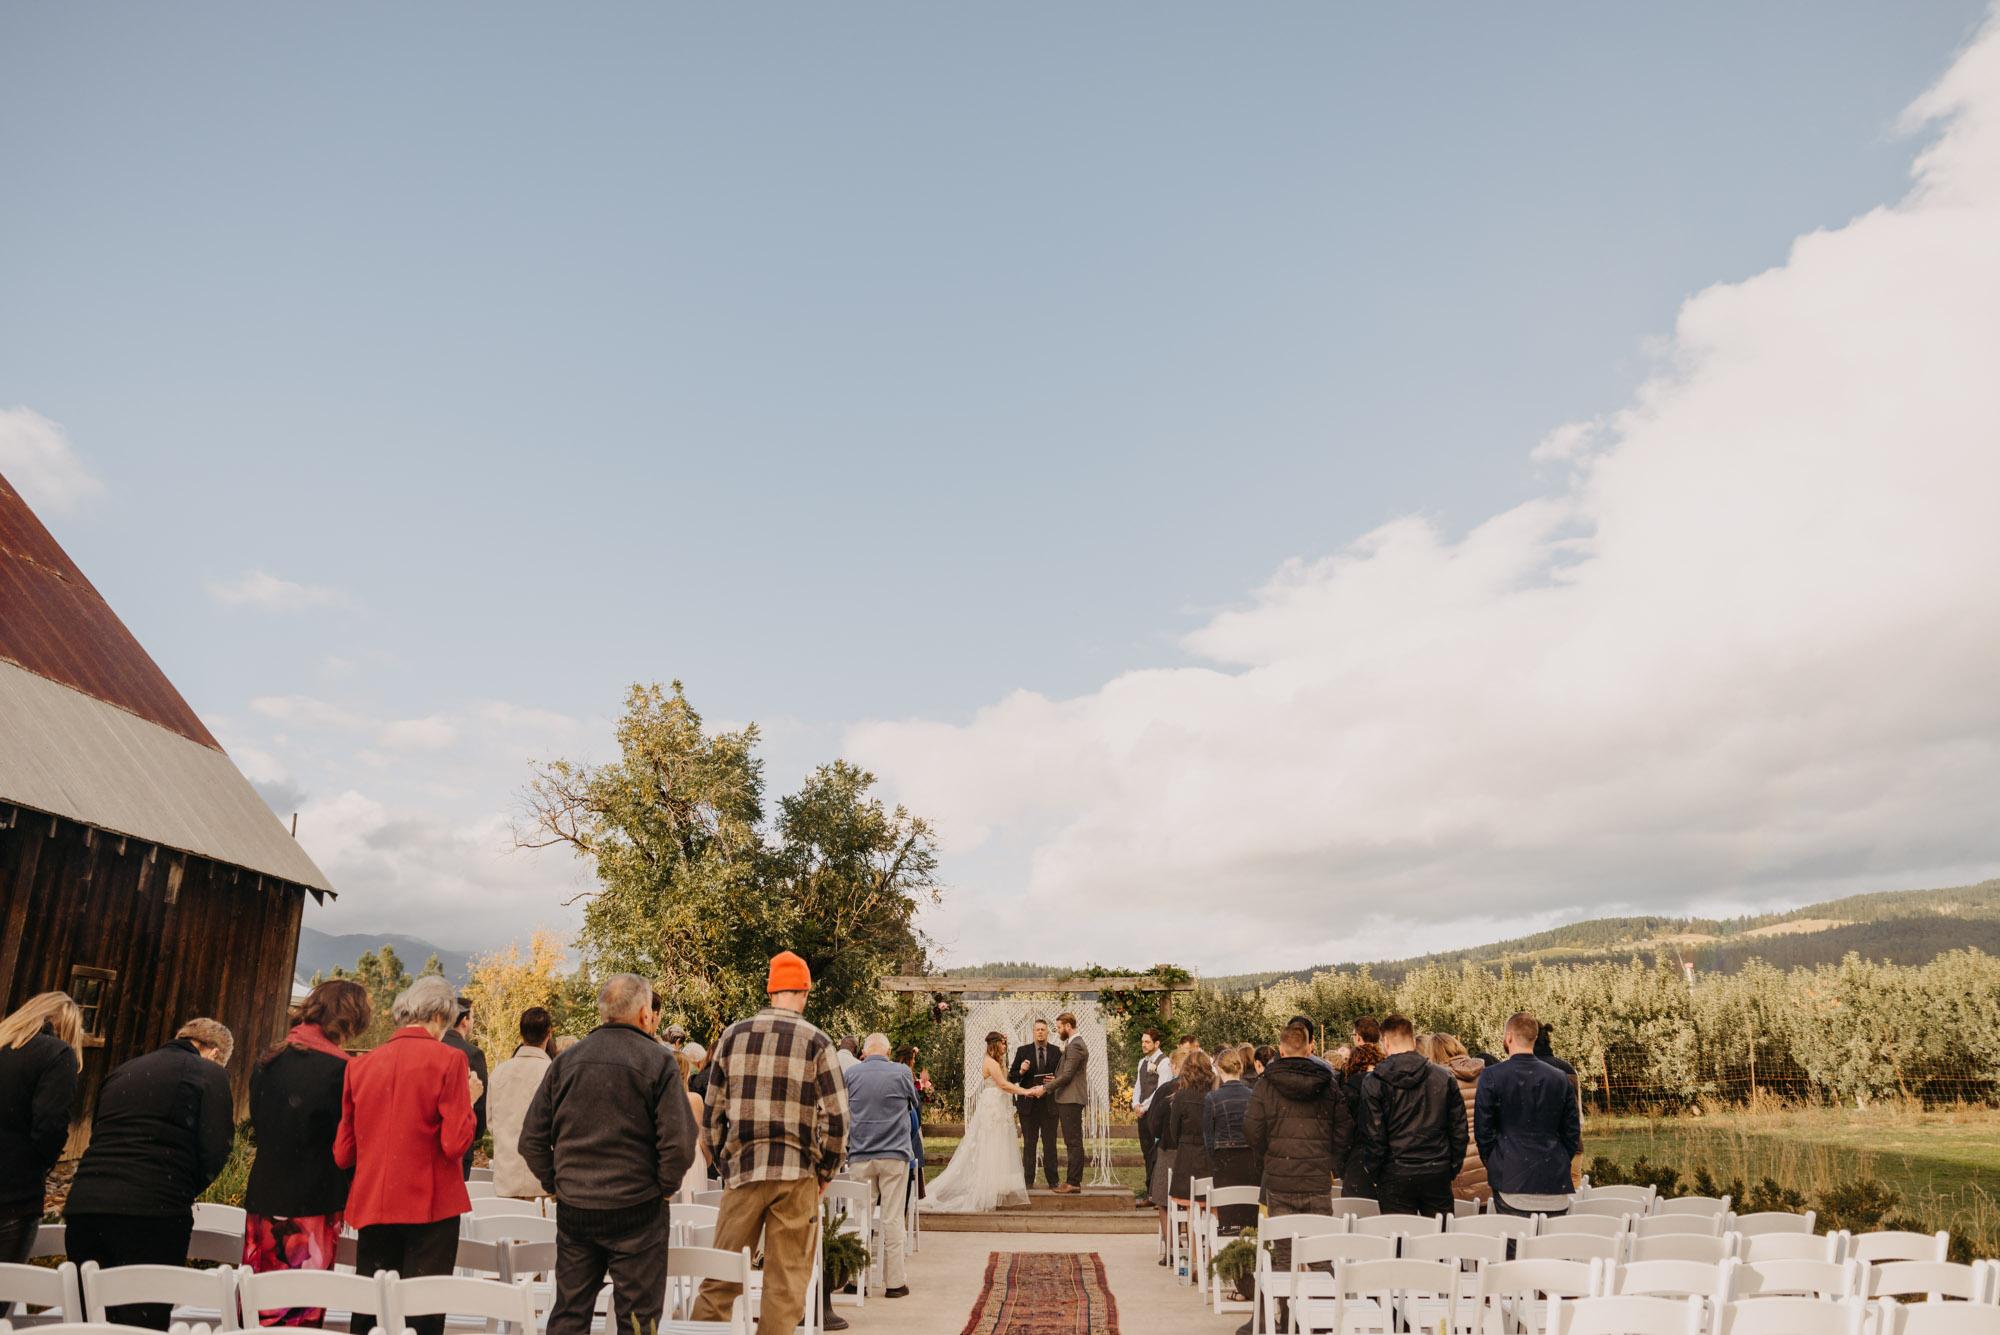 Outdoor-Summer-Ceremony-Washington-Wedding-Rainbow-5362.jpg